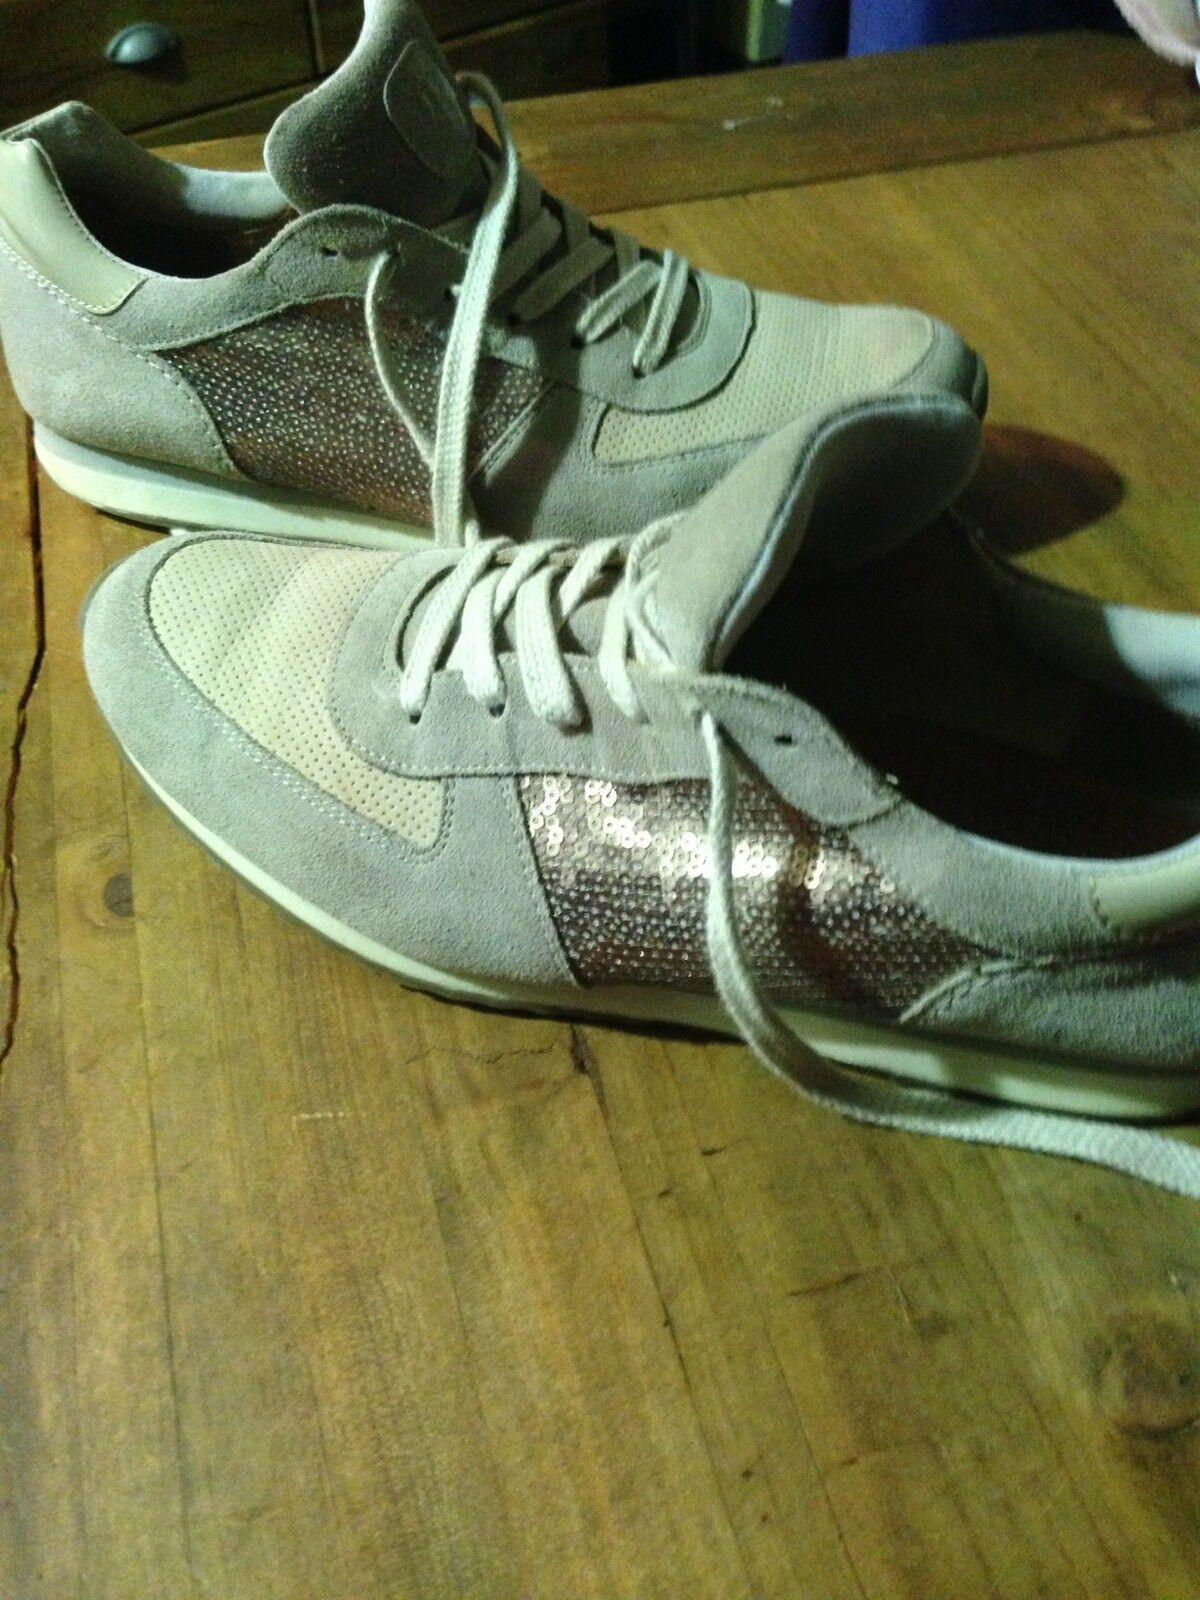 Paul Grün Grün Grün Sneaker 40/6,5 Beige 07fea3